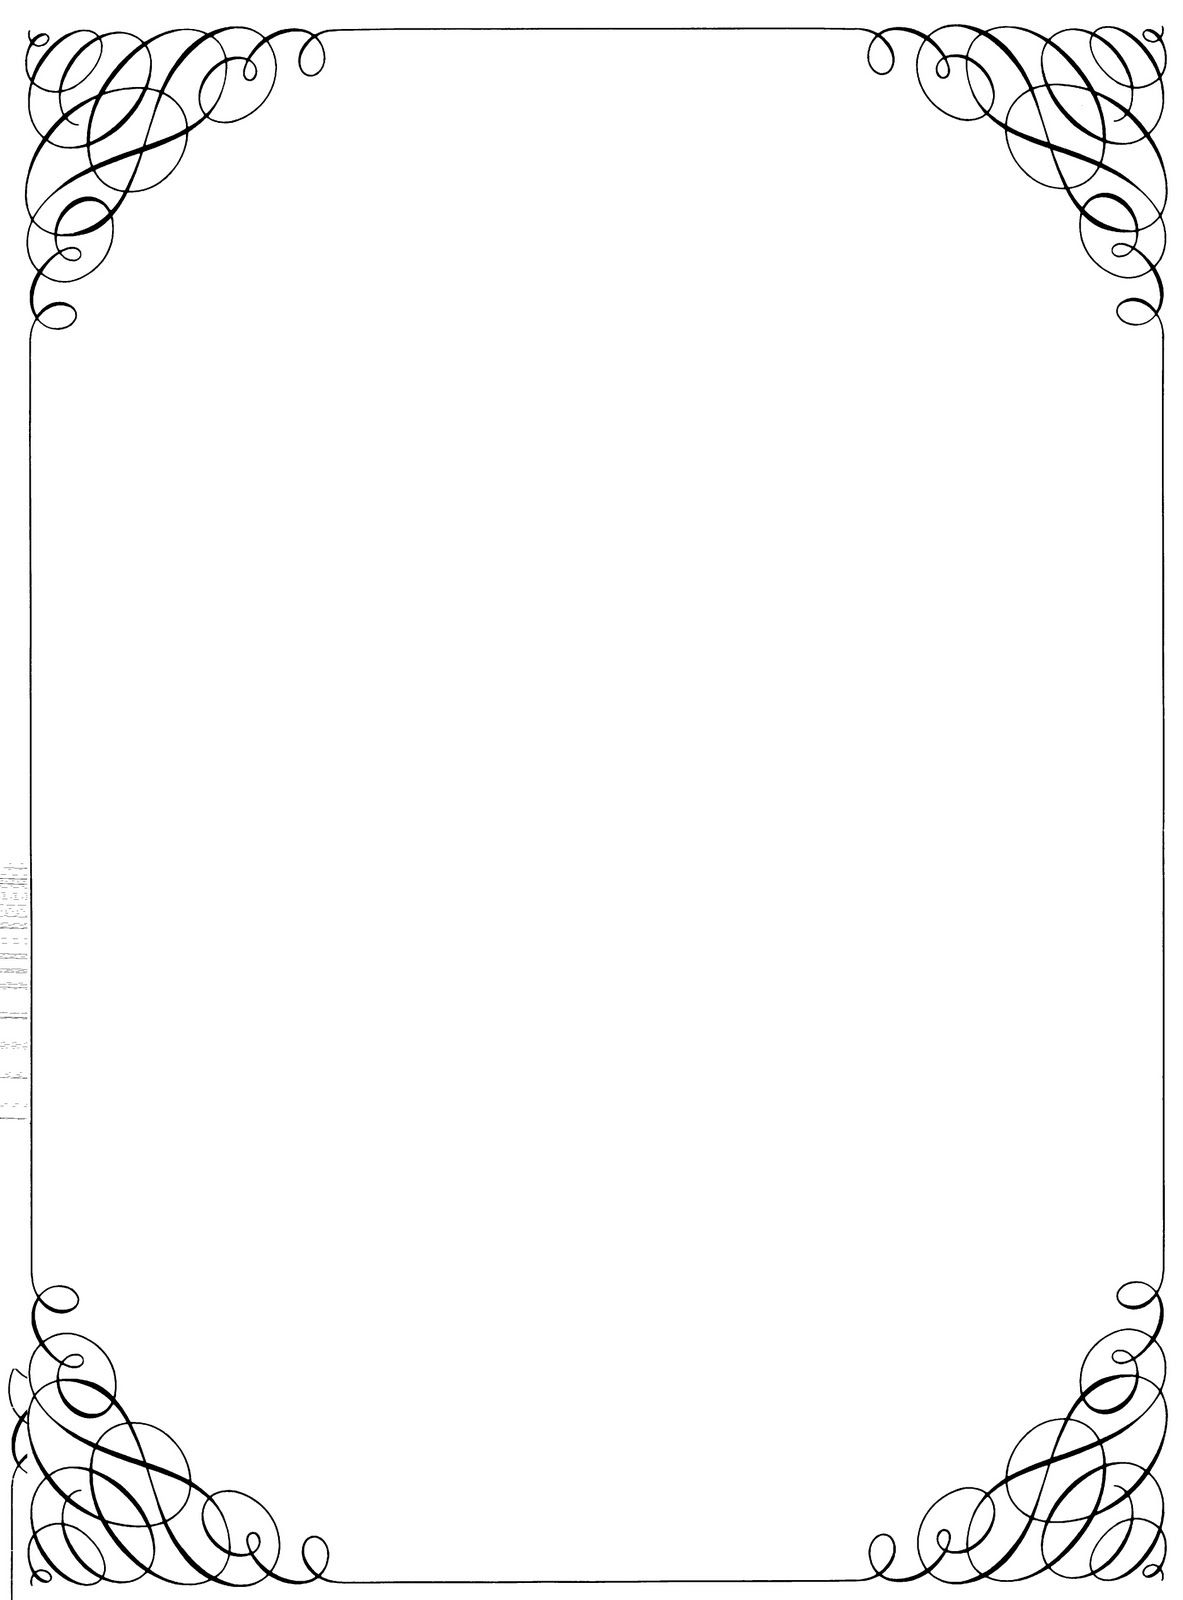 November corner frame clipart black and white picture black and white download Black And White Christmas Borders And Frames 110 x 150 ... picture black and white download